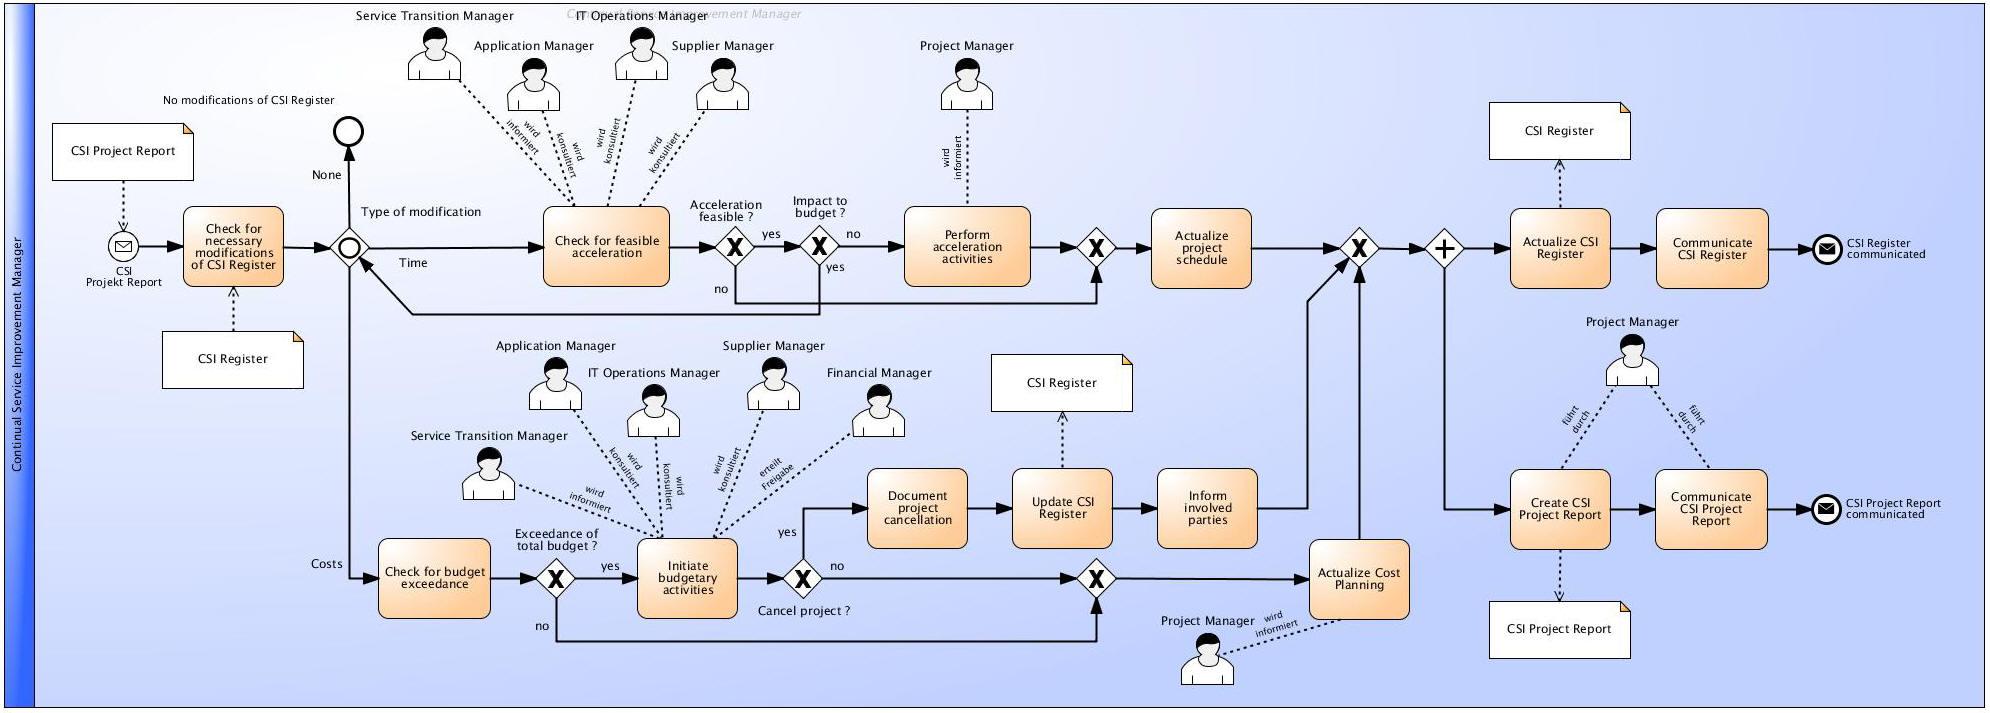 Process Management Of Improvement Activities